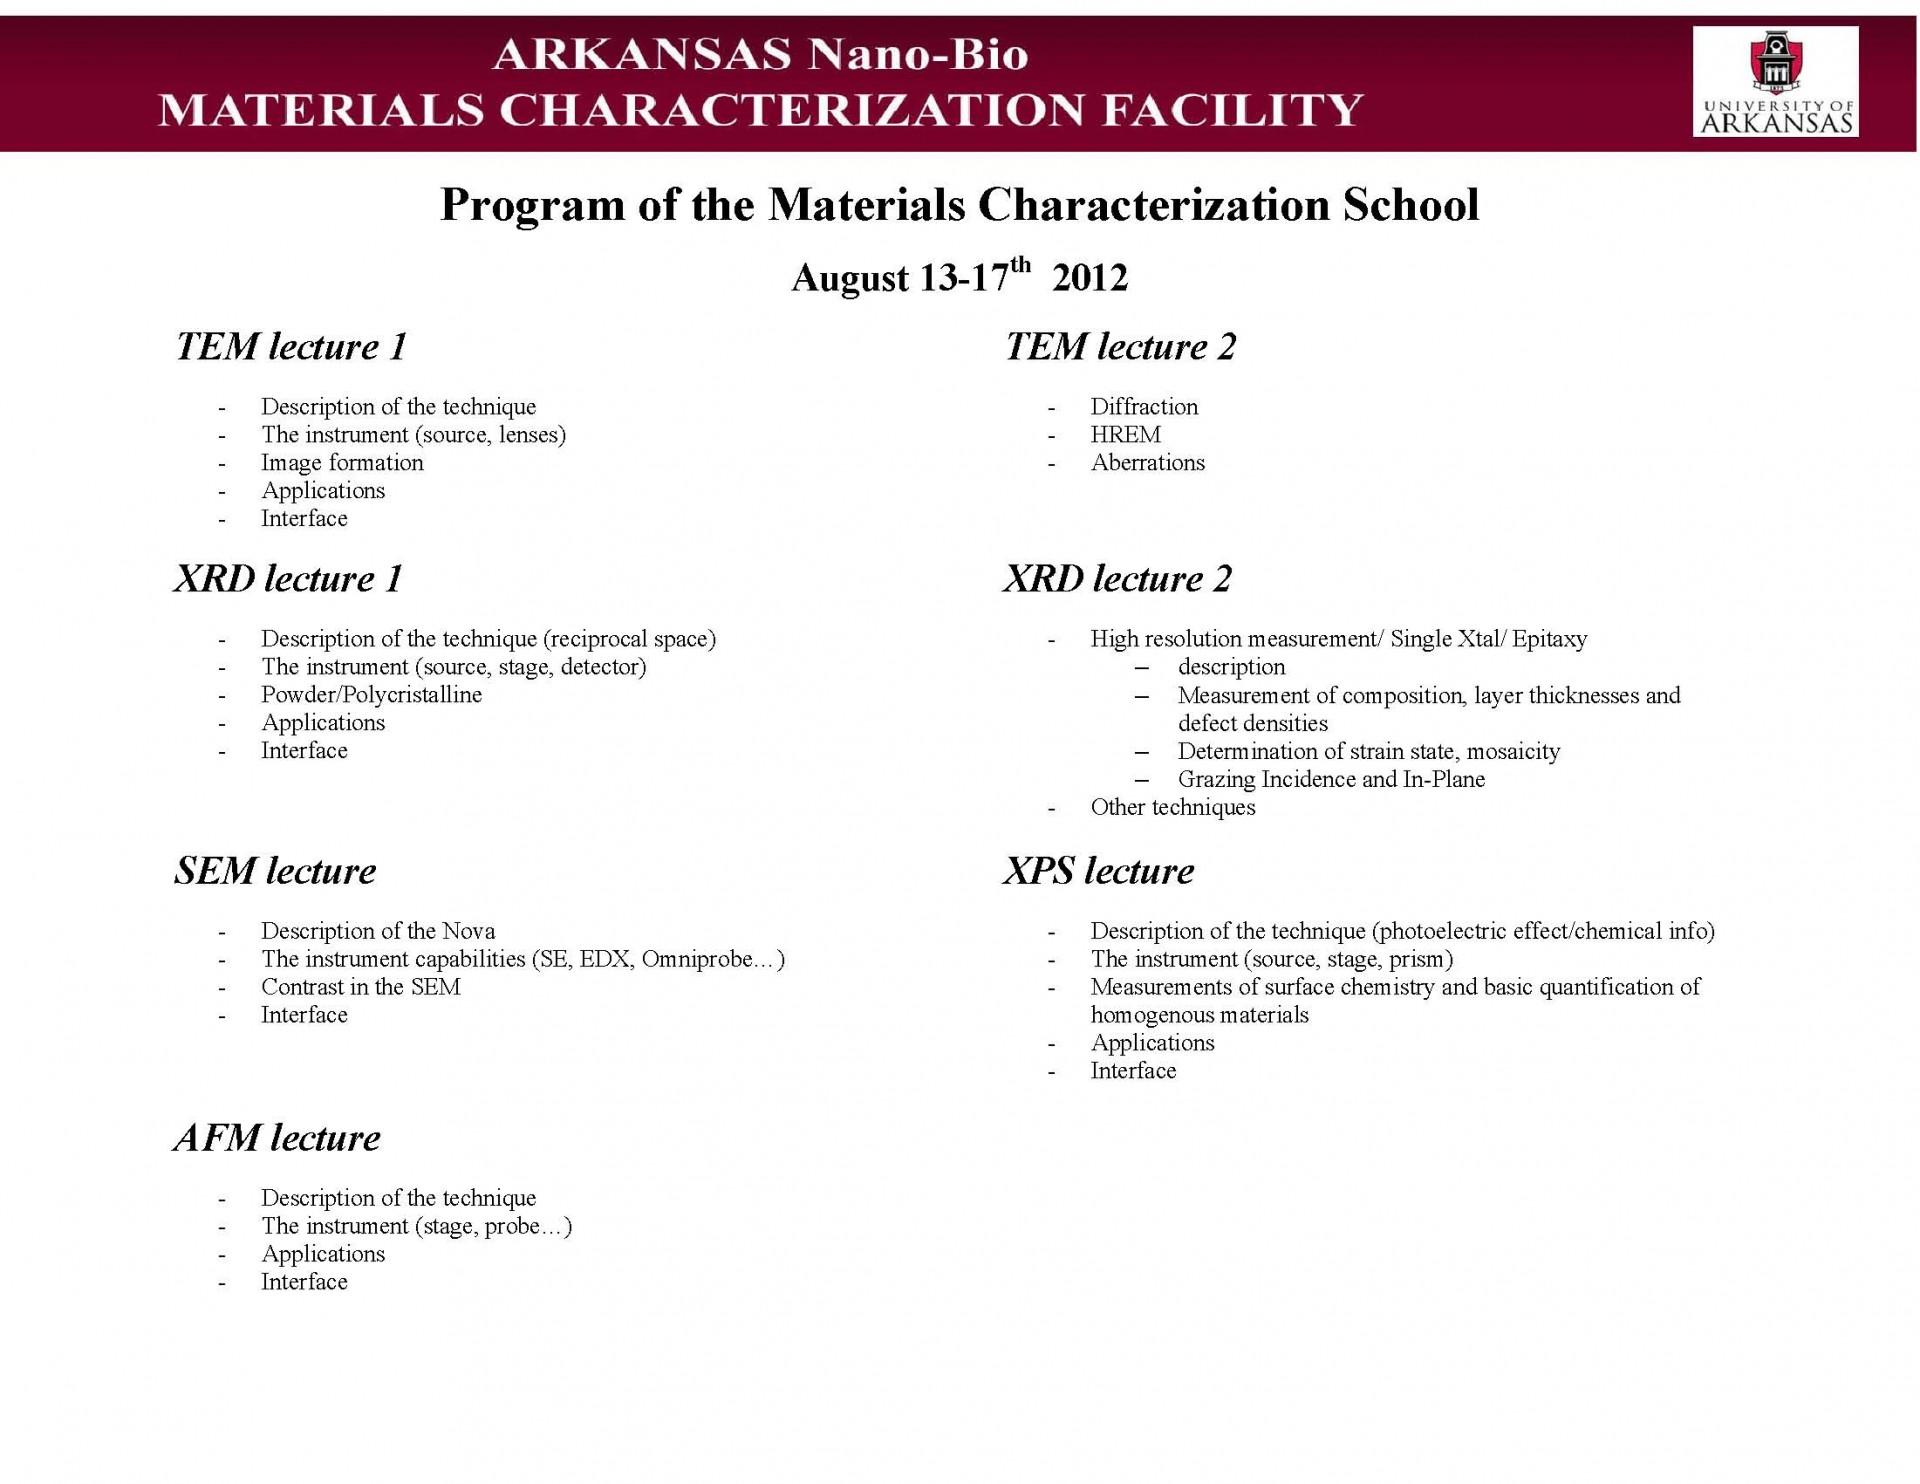 Materials Characterization Program